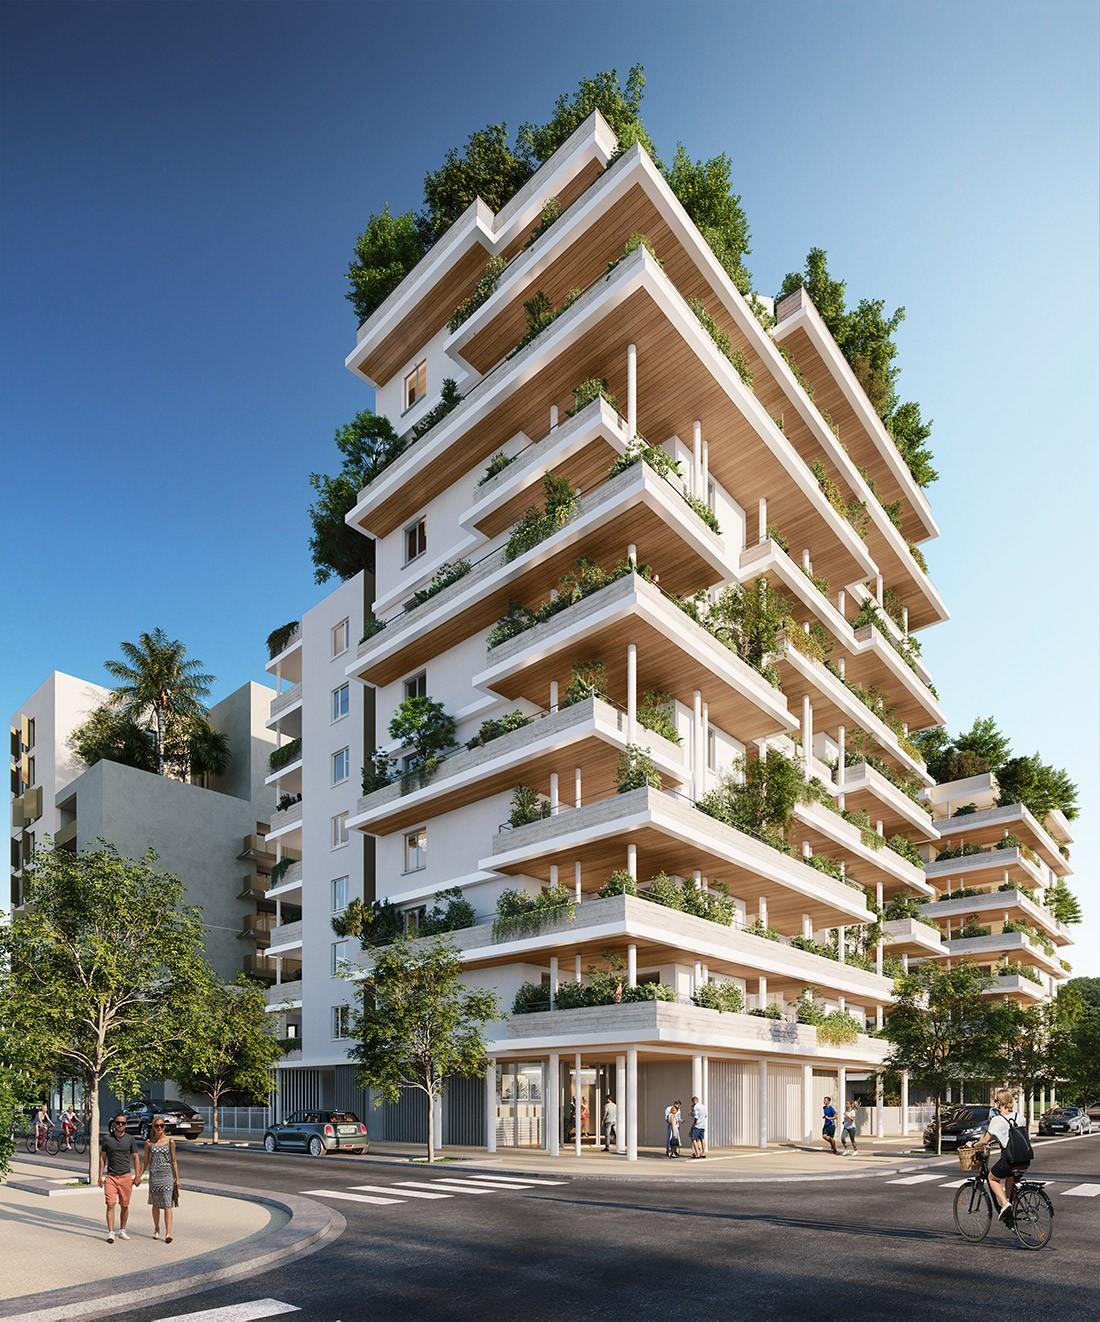 Odyssée Rive Gauche L'apogée Montpellier Port Marianne immobilier neuf terrasse